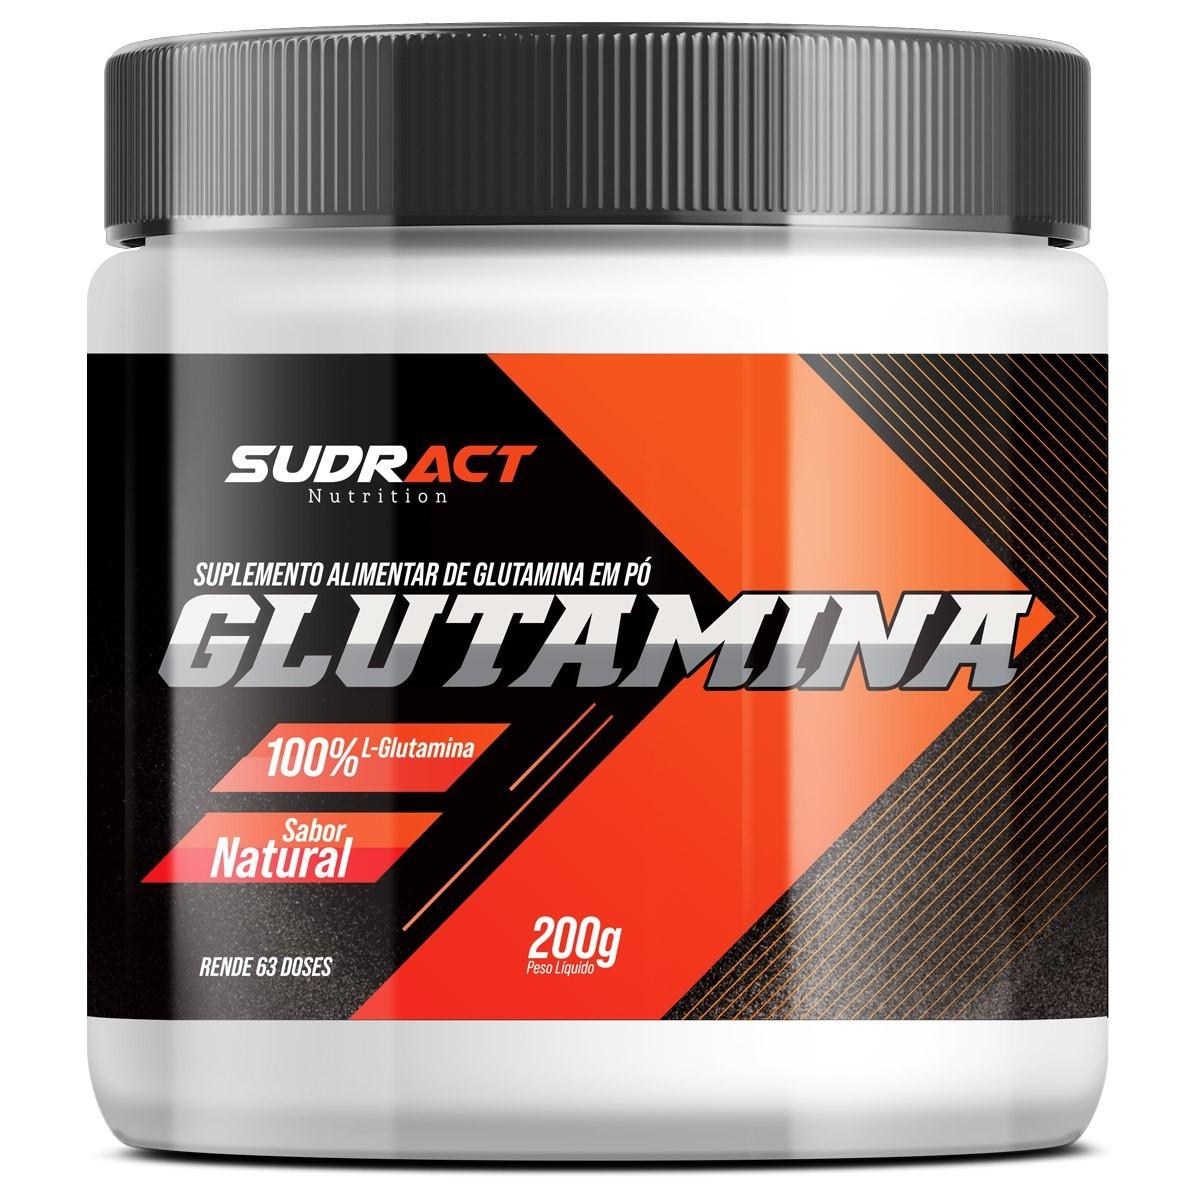 Glutamina - Sudract Nutrition